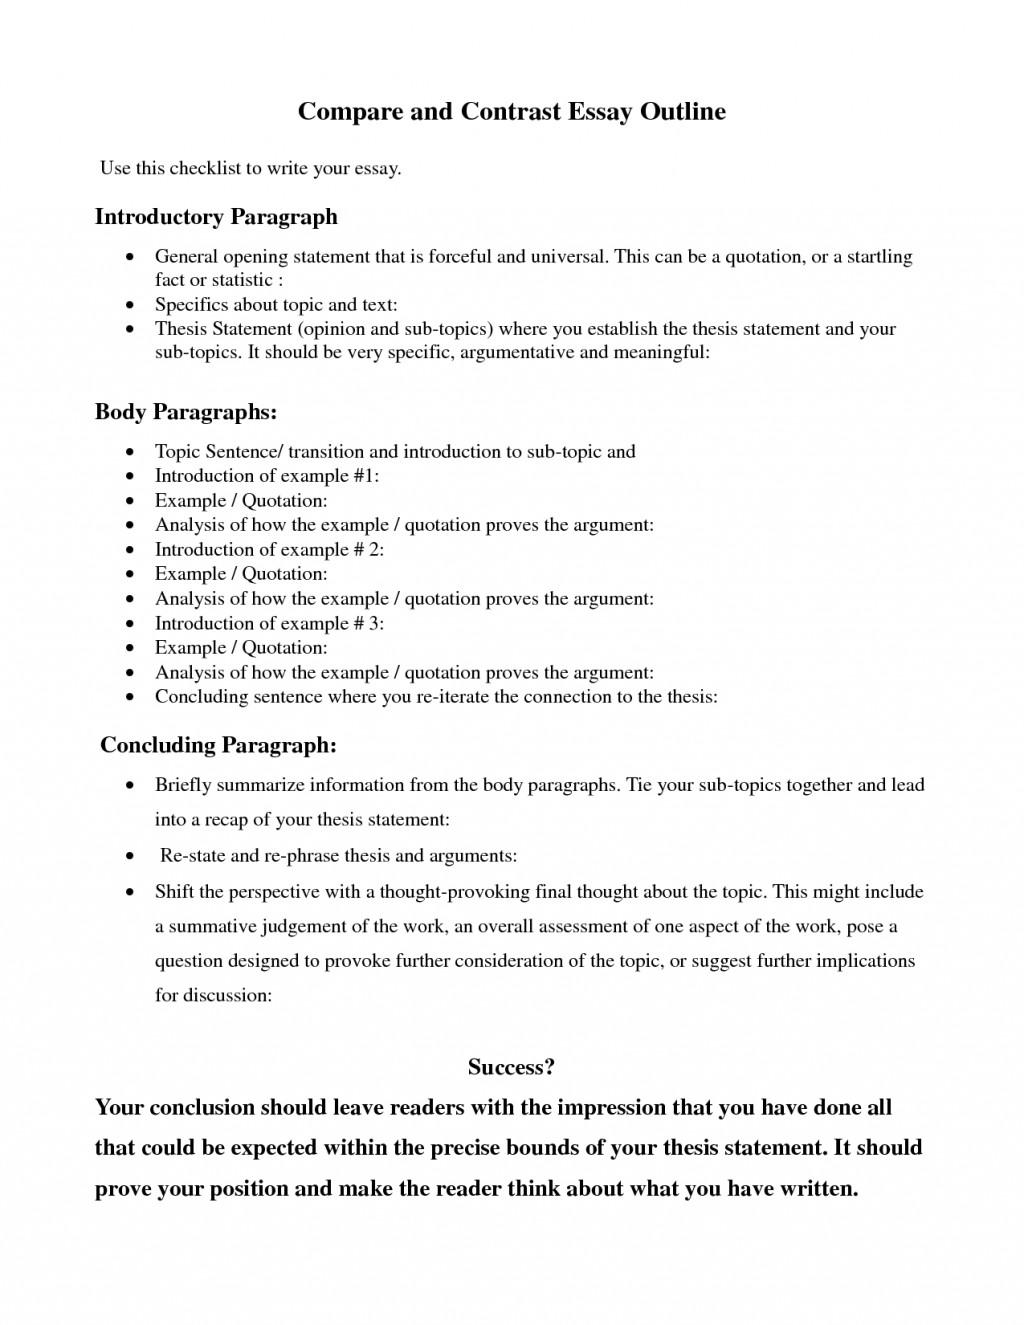 002 Compare Contrast Essays Unusual Essay Examples High School Vs College Comparison Pdf And Topics 6th Grade Large